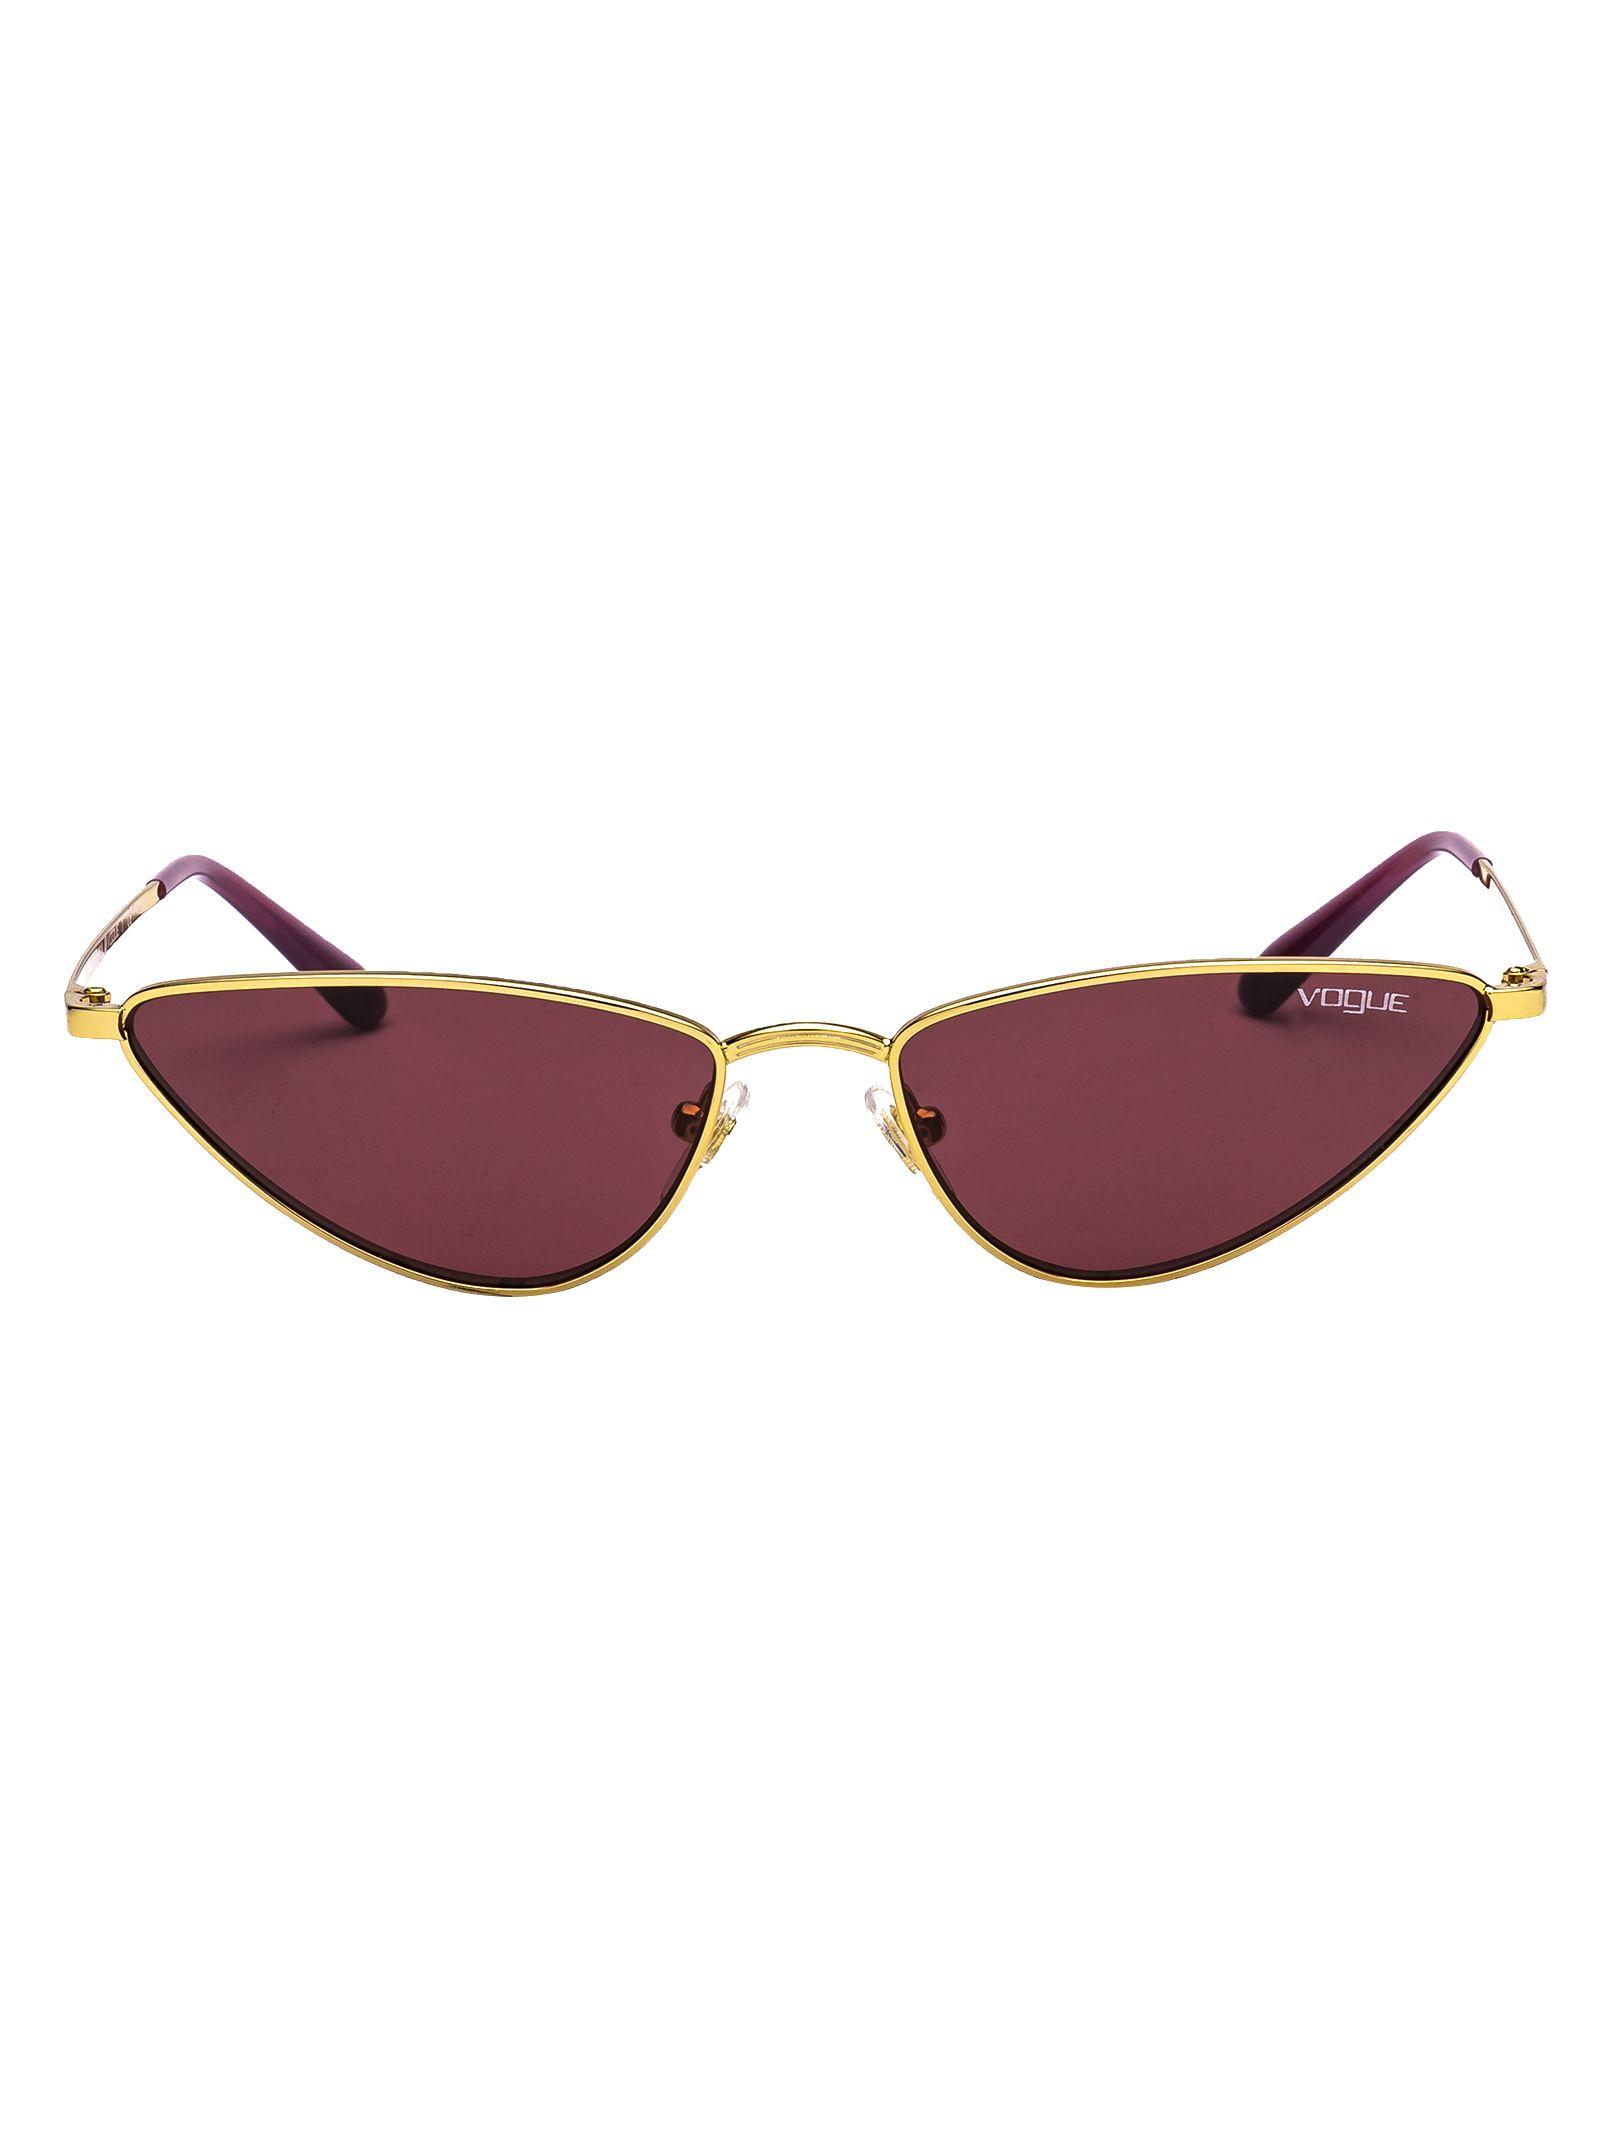 Vogue Eyewear Cat Eye Sunglasses